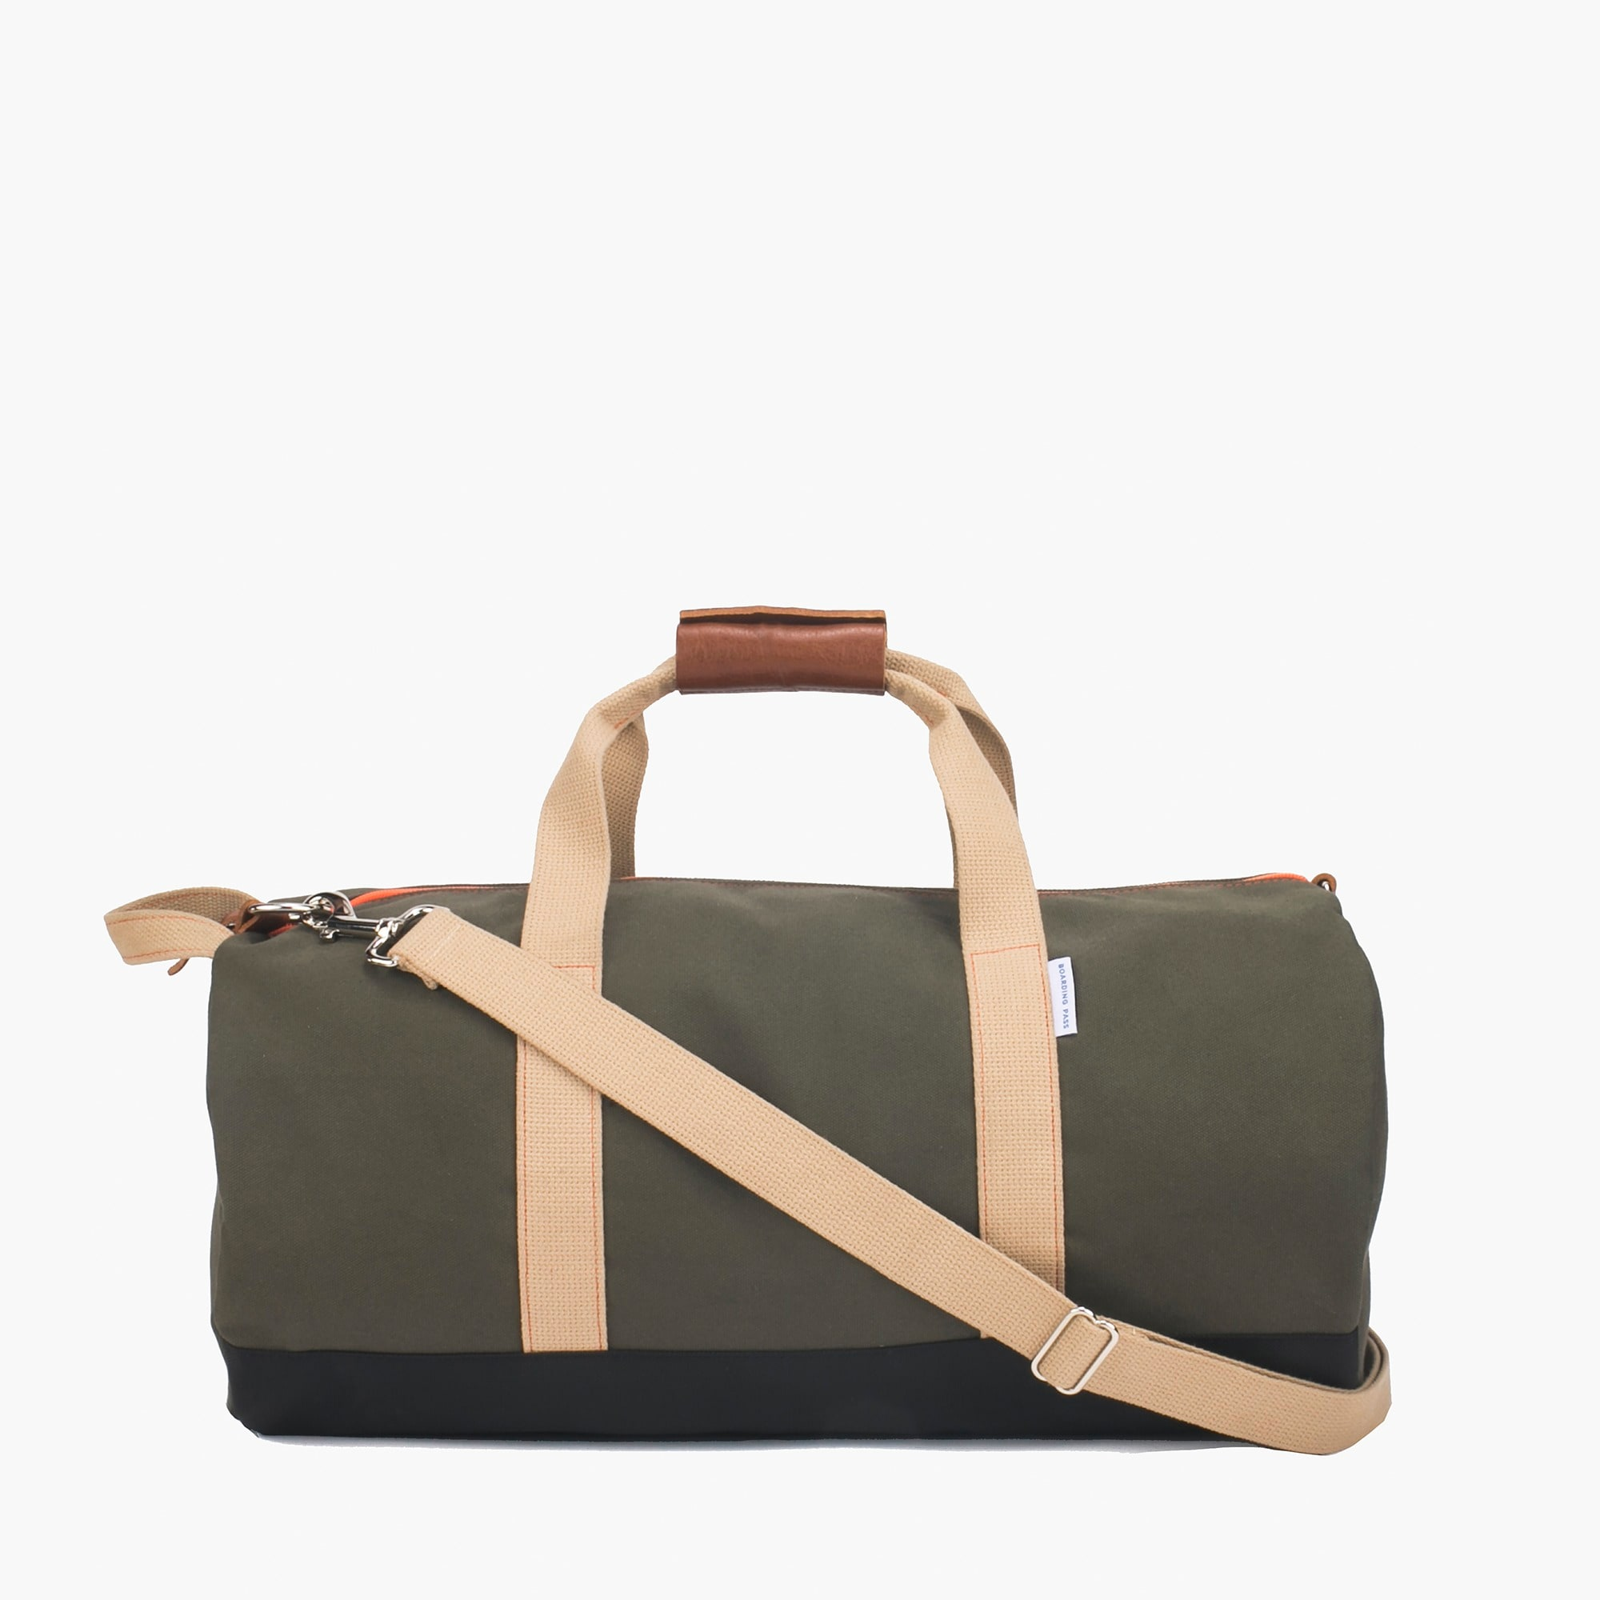 Boarding Pass NYC™ Work Hard, Play Hard duffel bag